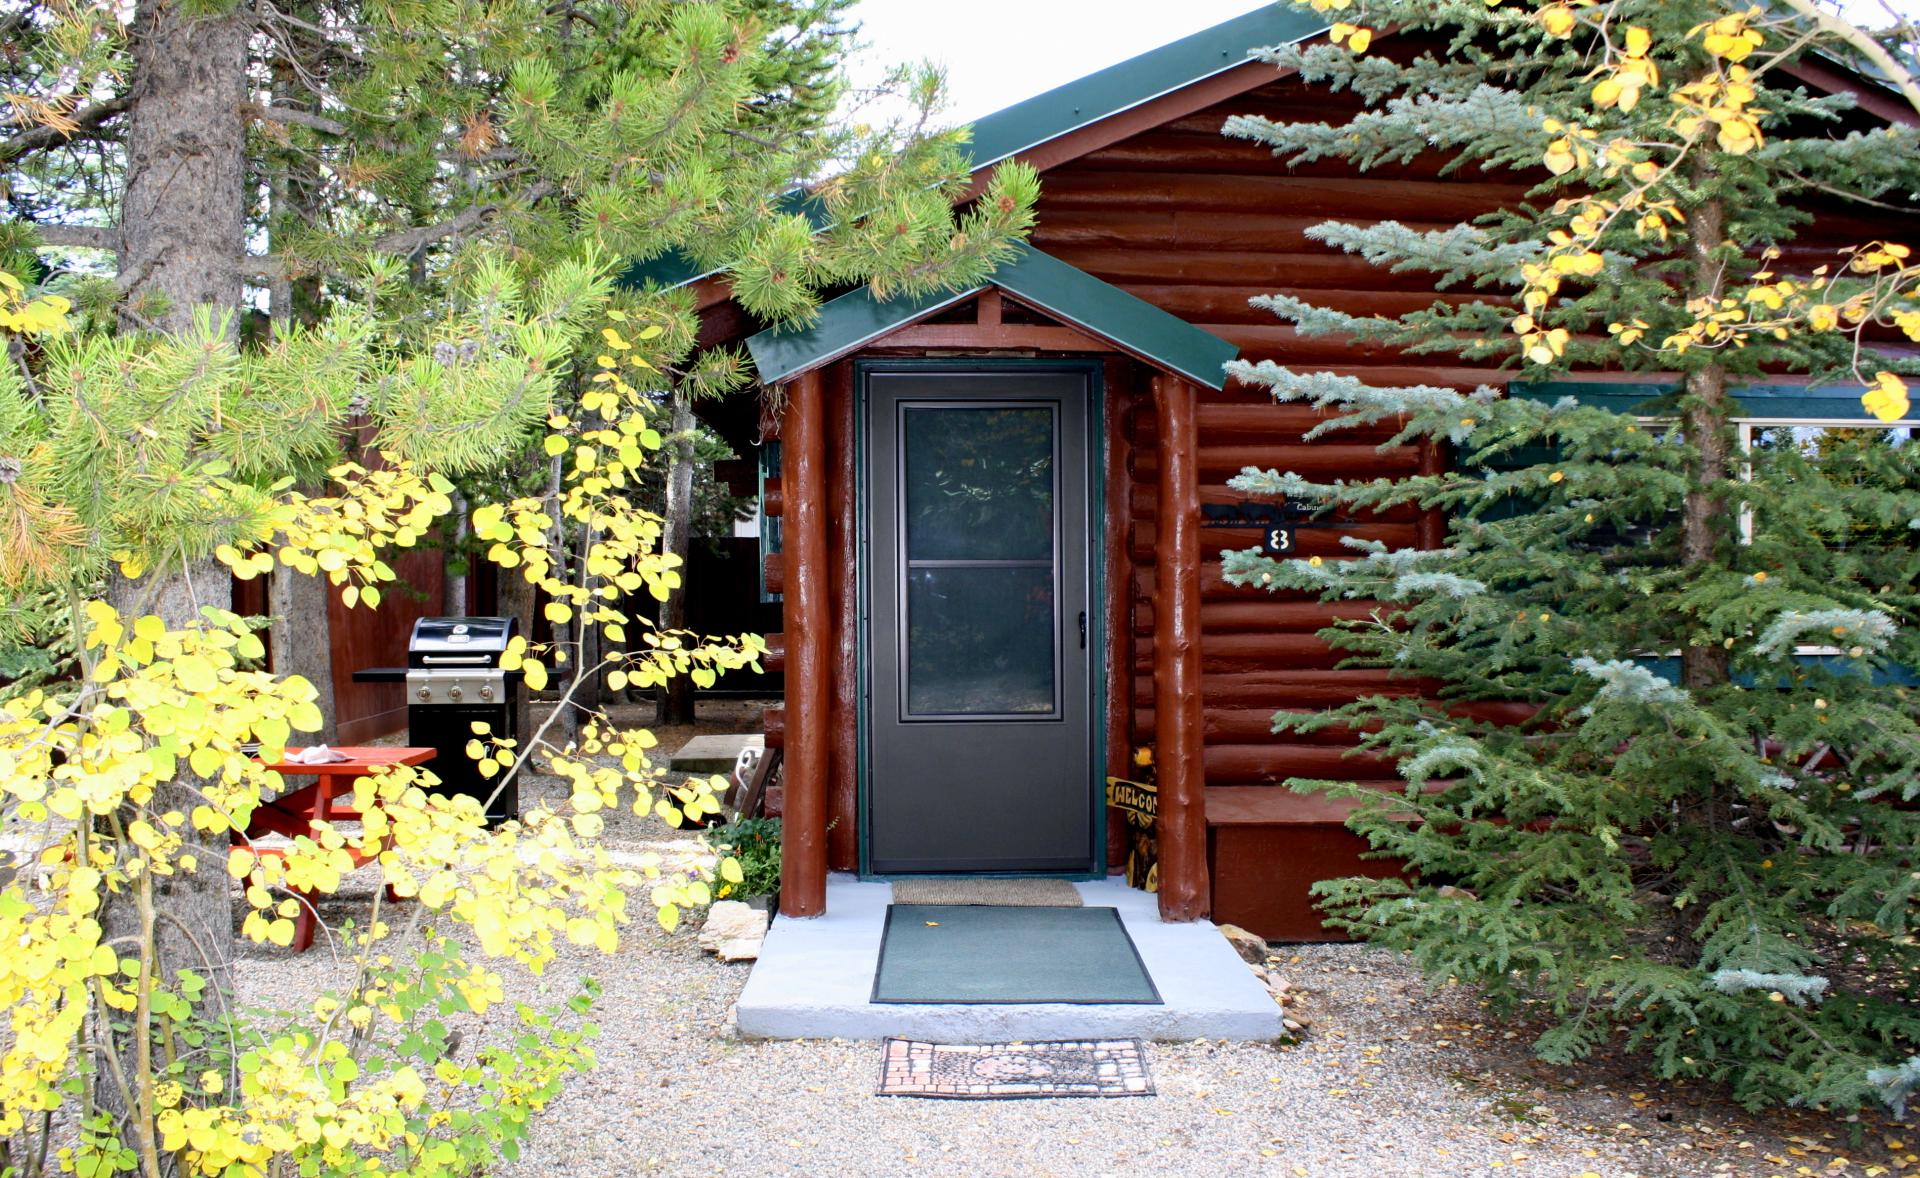 Cabin 8 entrance